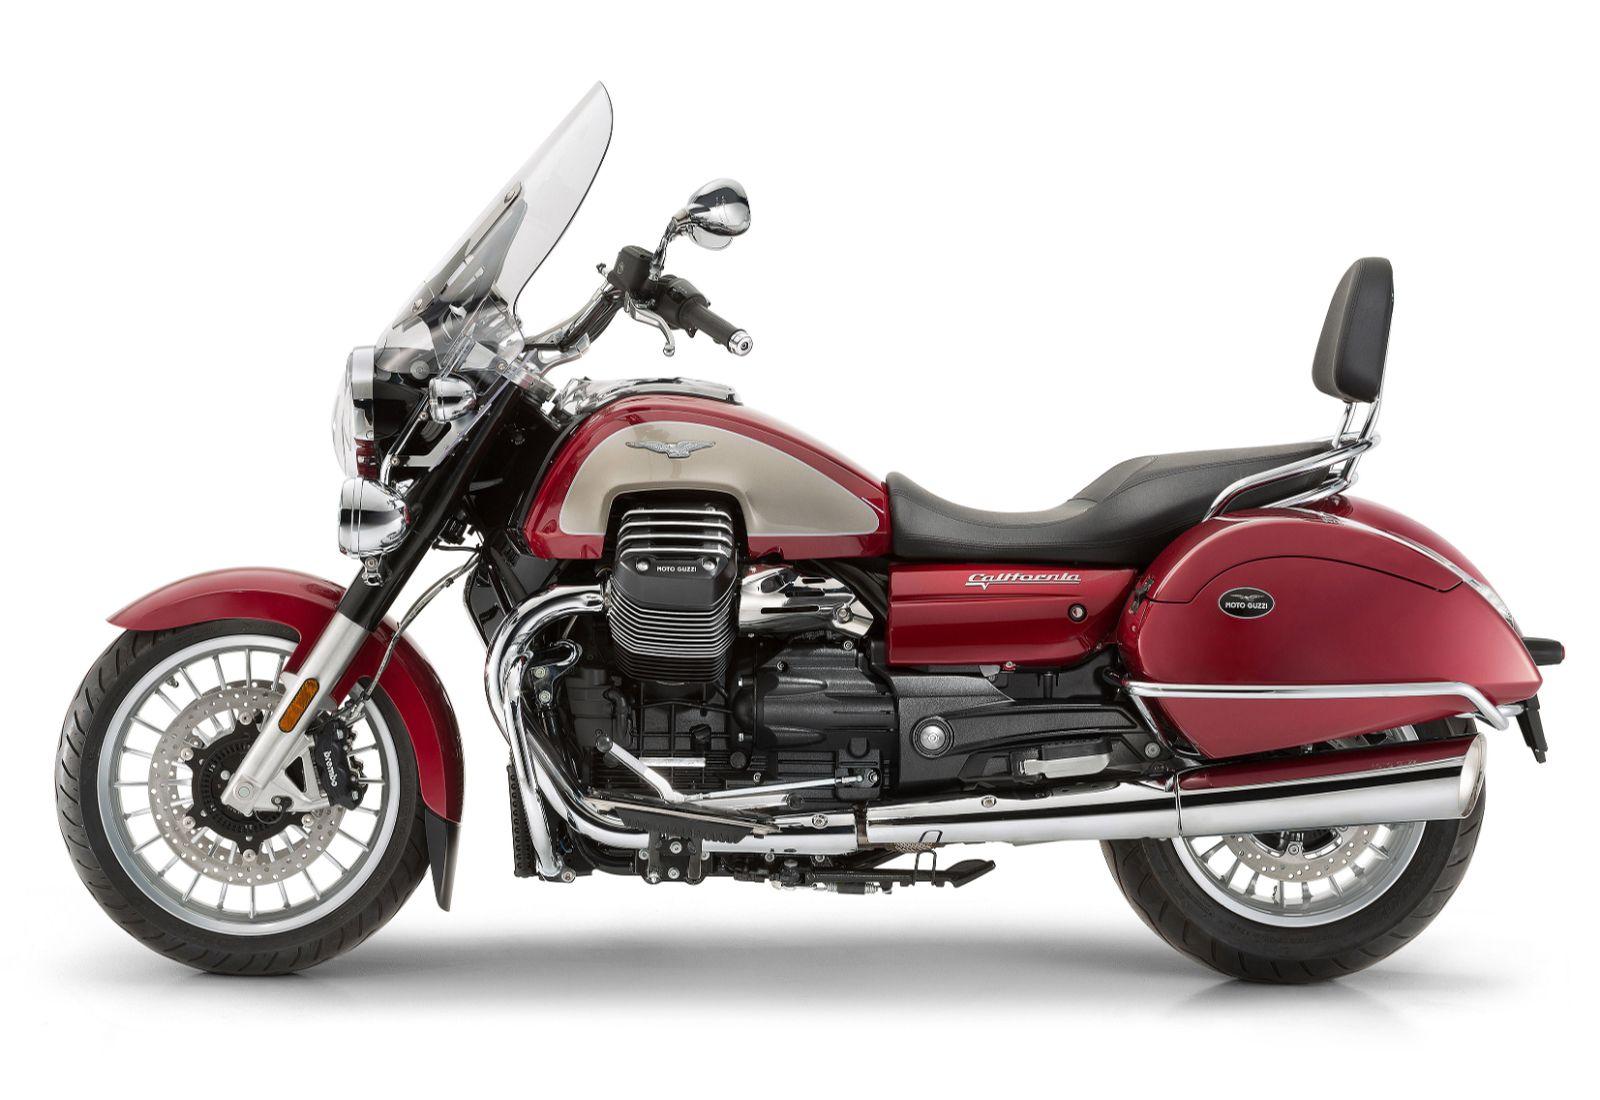 06-Moto-Guzzi-California-Touring